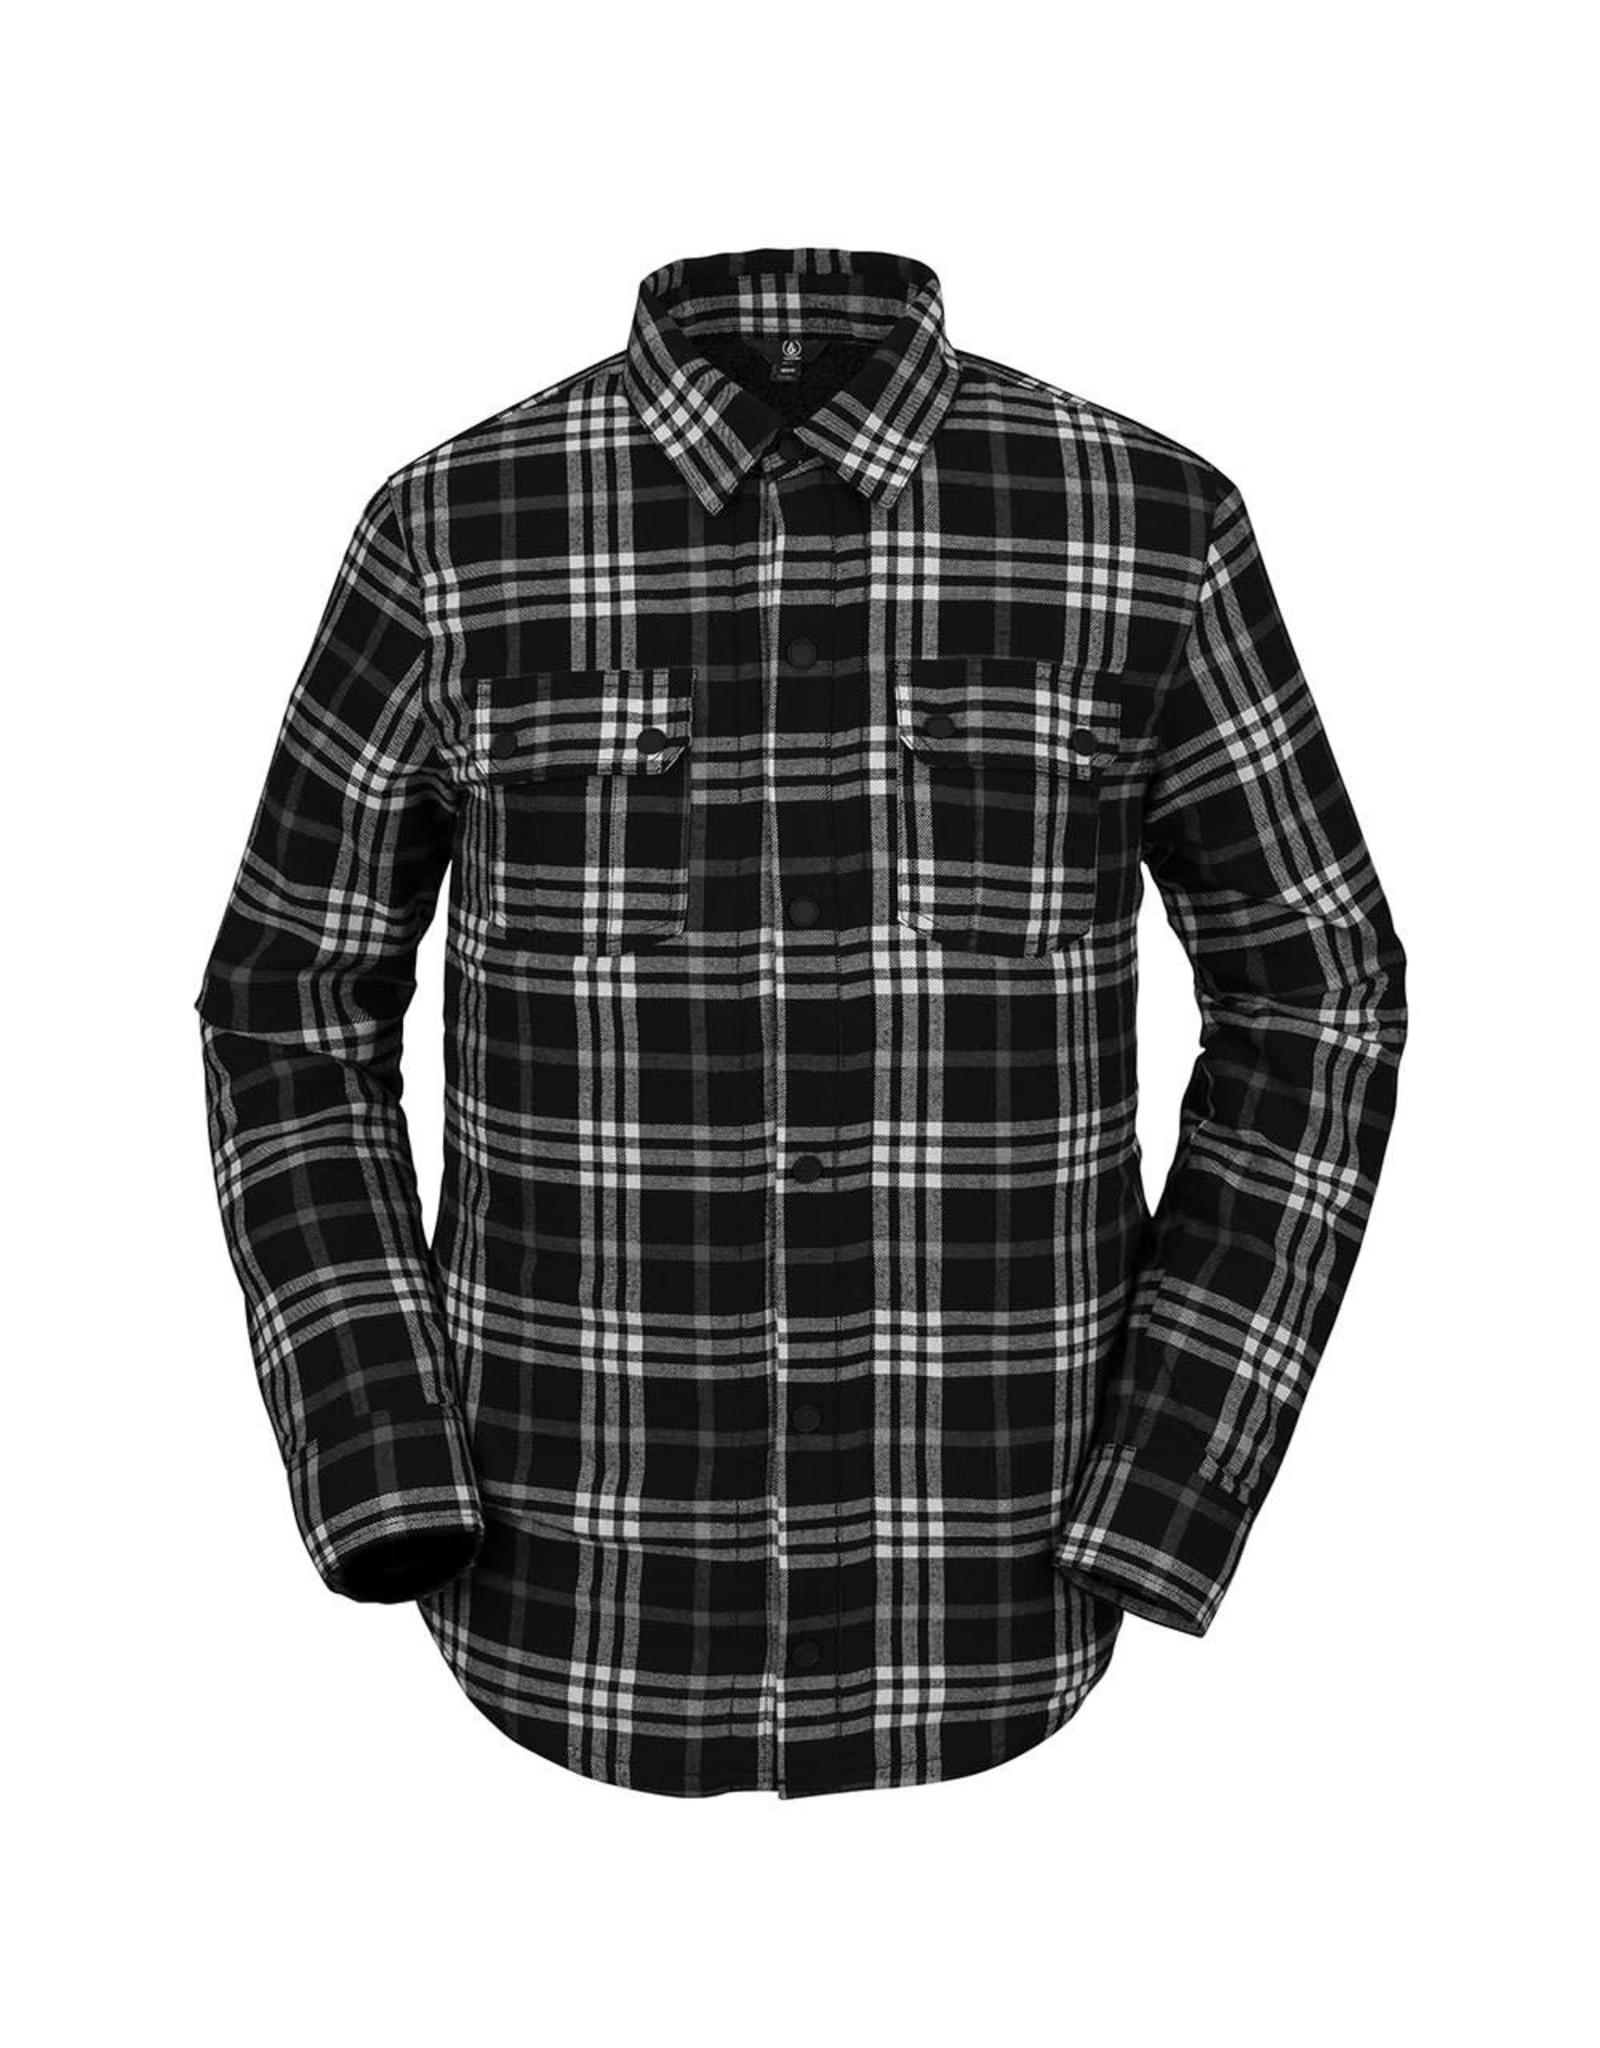 VOLCOM Sherpa Flannel Jacket - Black